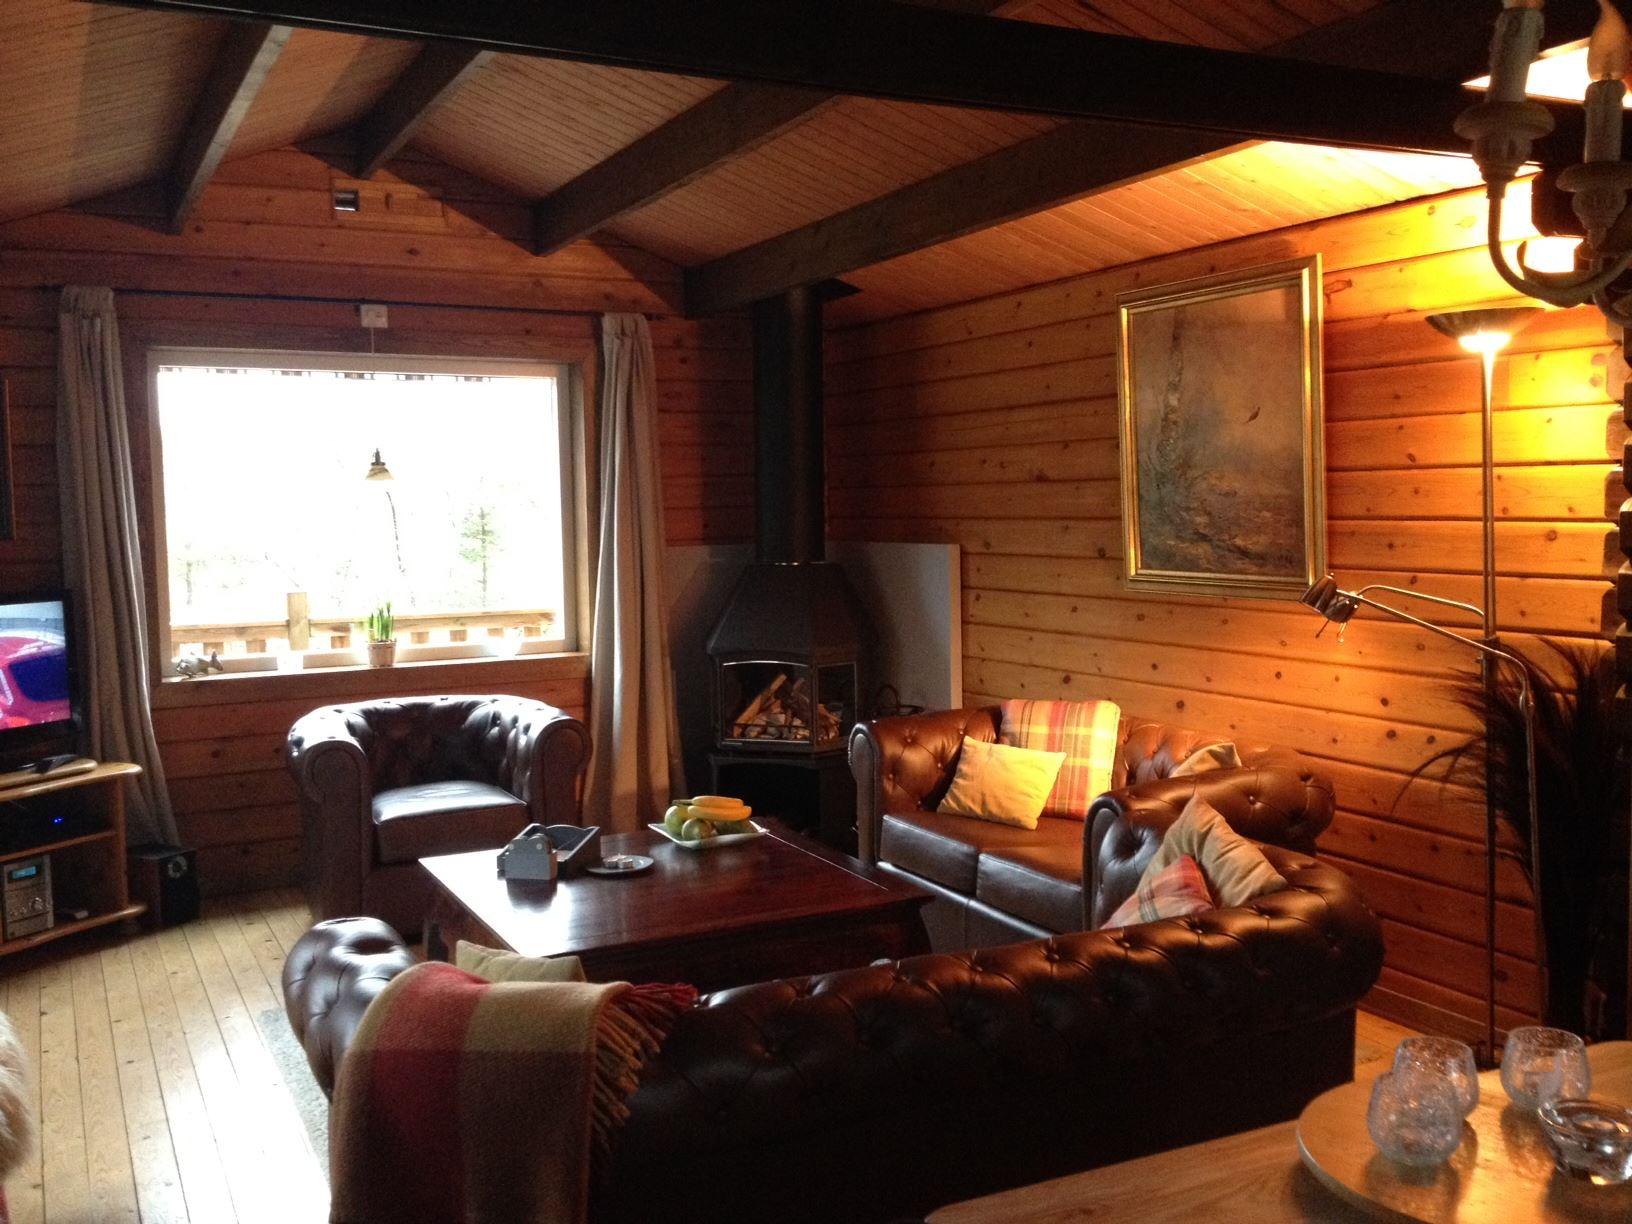 Tanne's cabins